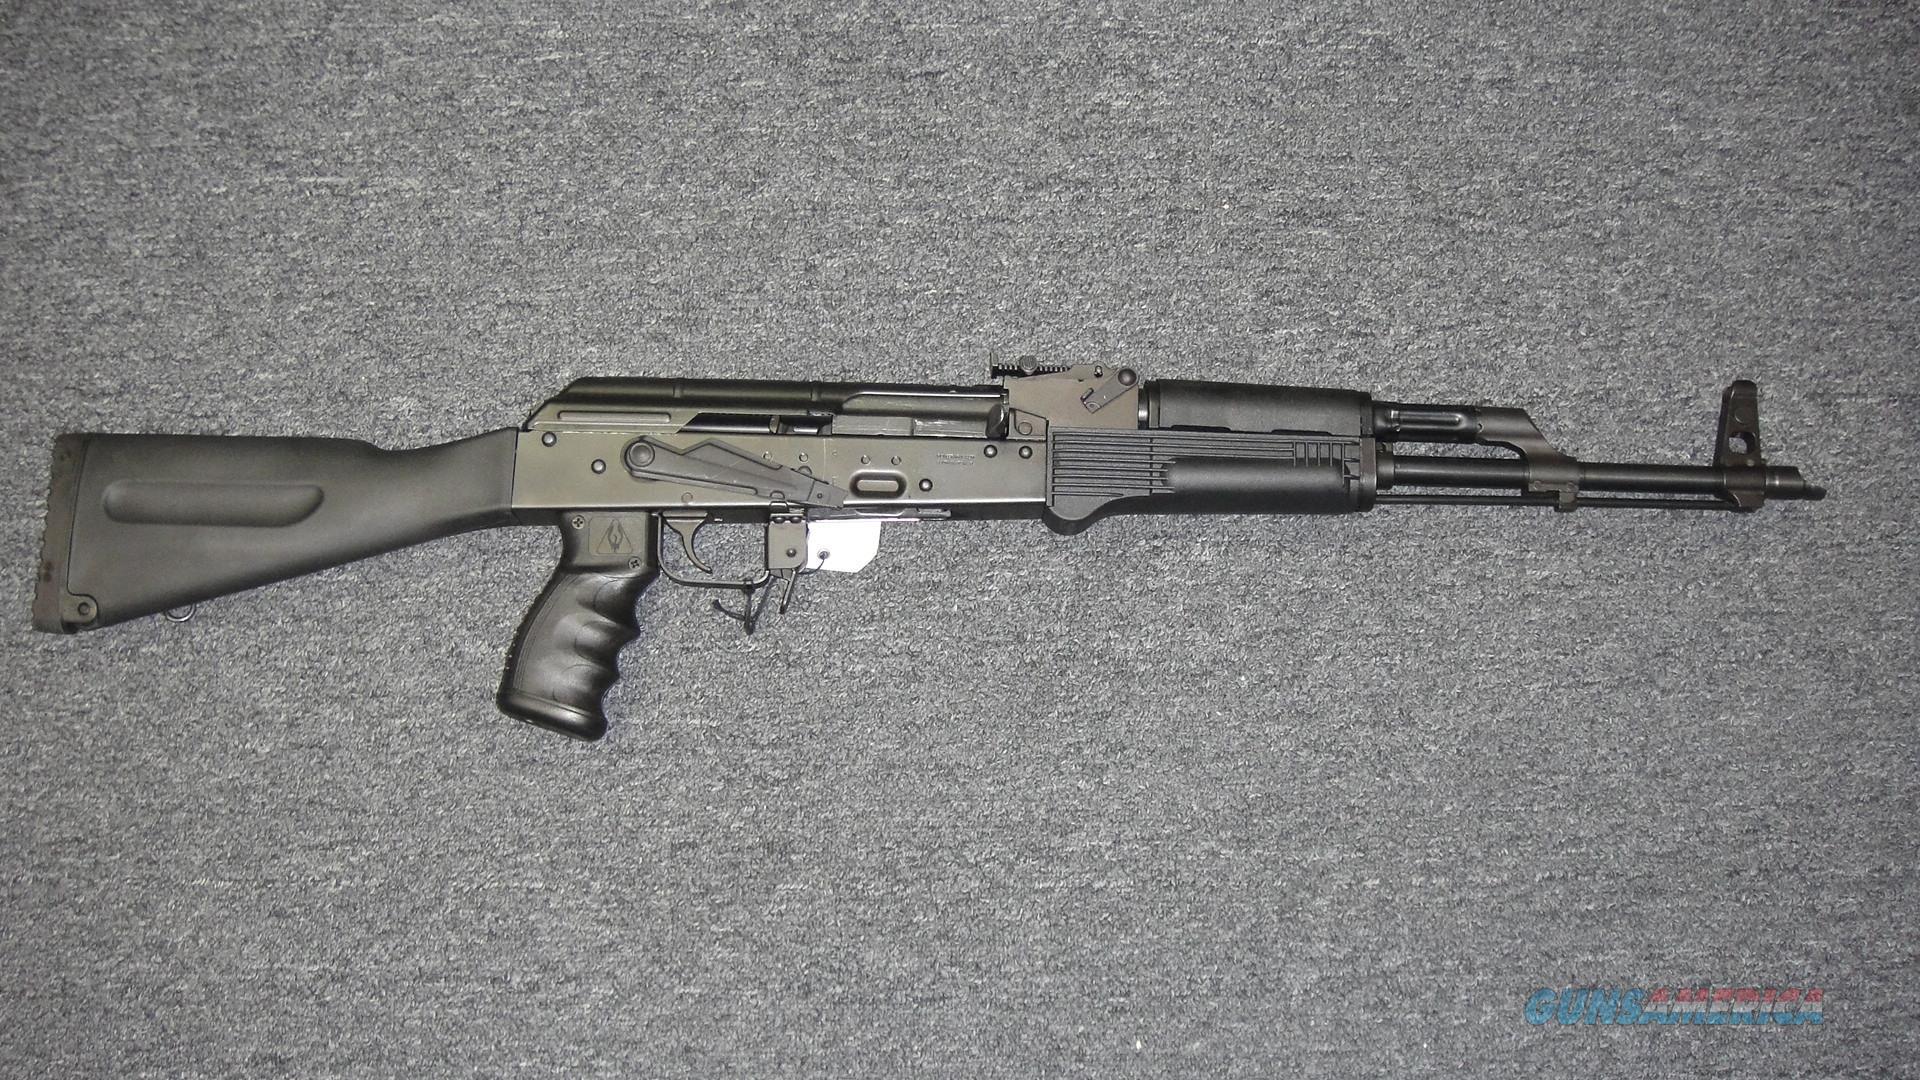 Pioneer Arms/JRA  (polish)  Guns > Rifles > AK-47 Rifles (and copies) > Full Stock